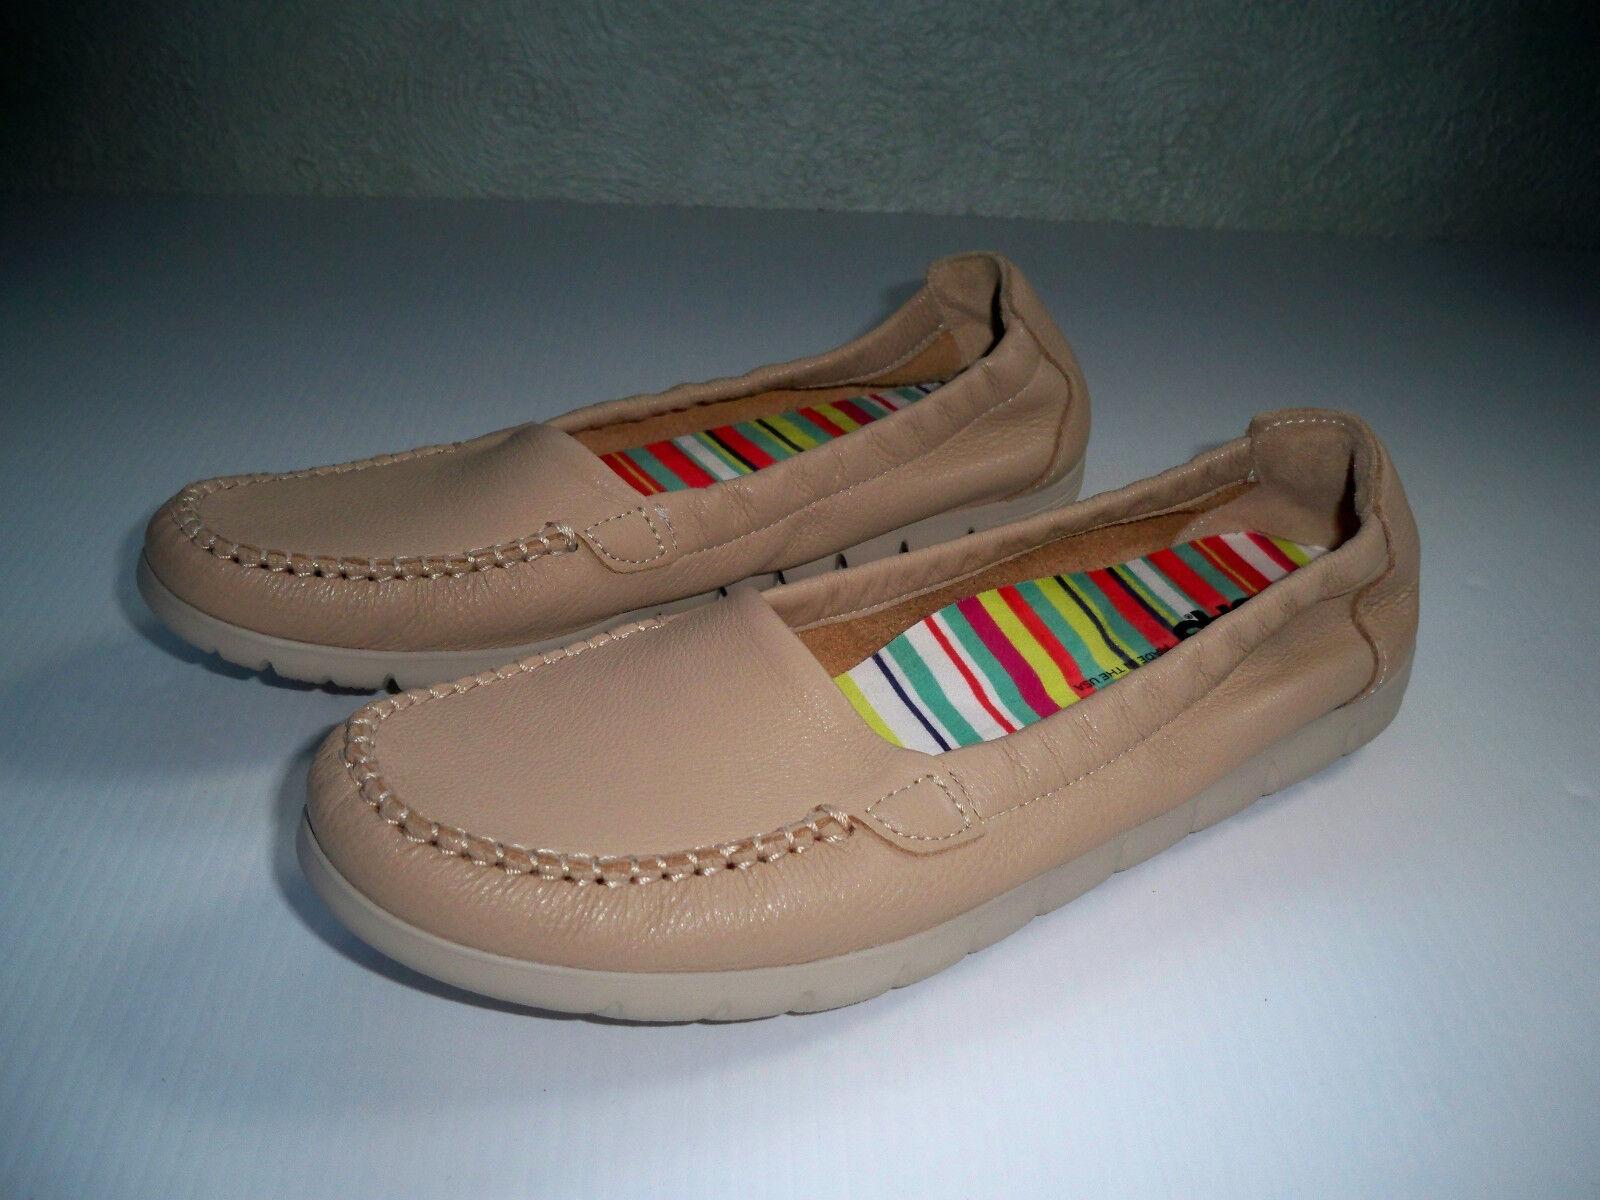 SAS Sunny Latte Slip-on Skimmers Moc-Toe Soft Leather shoes SZ 9.5 S EXCELLENT